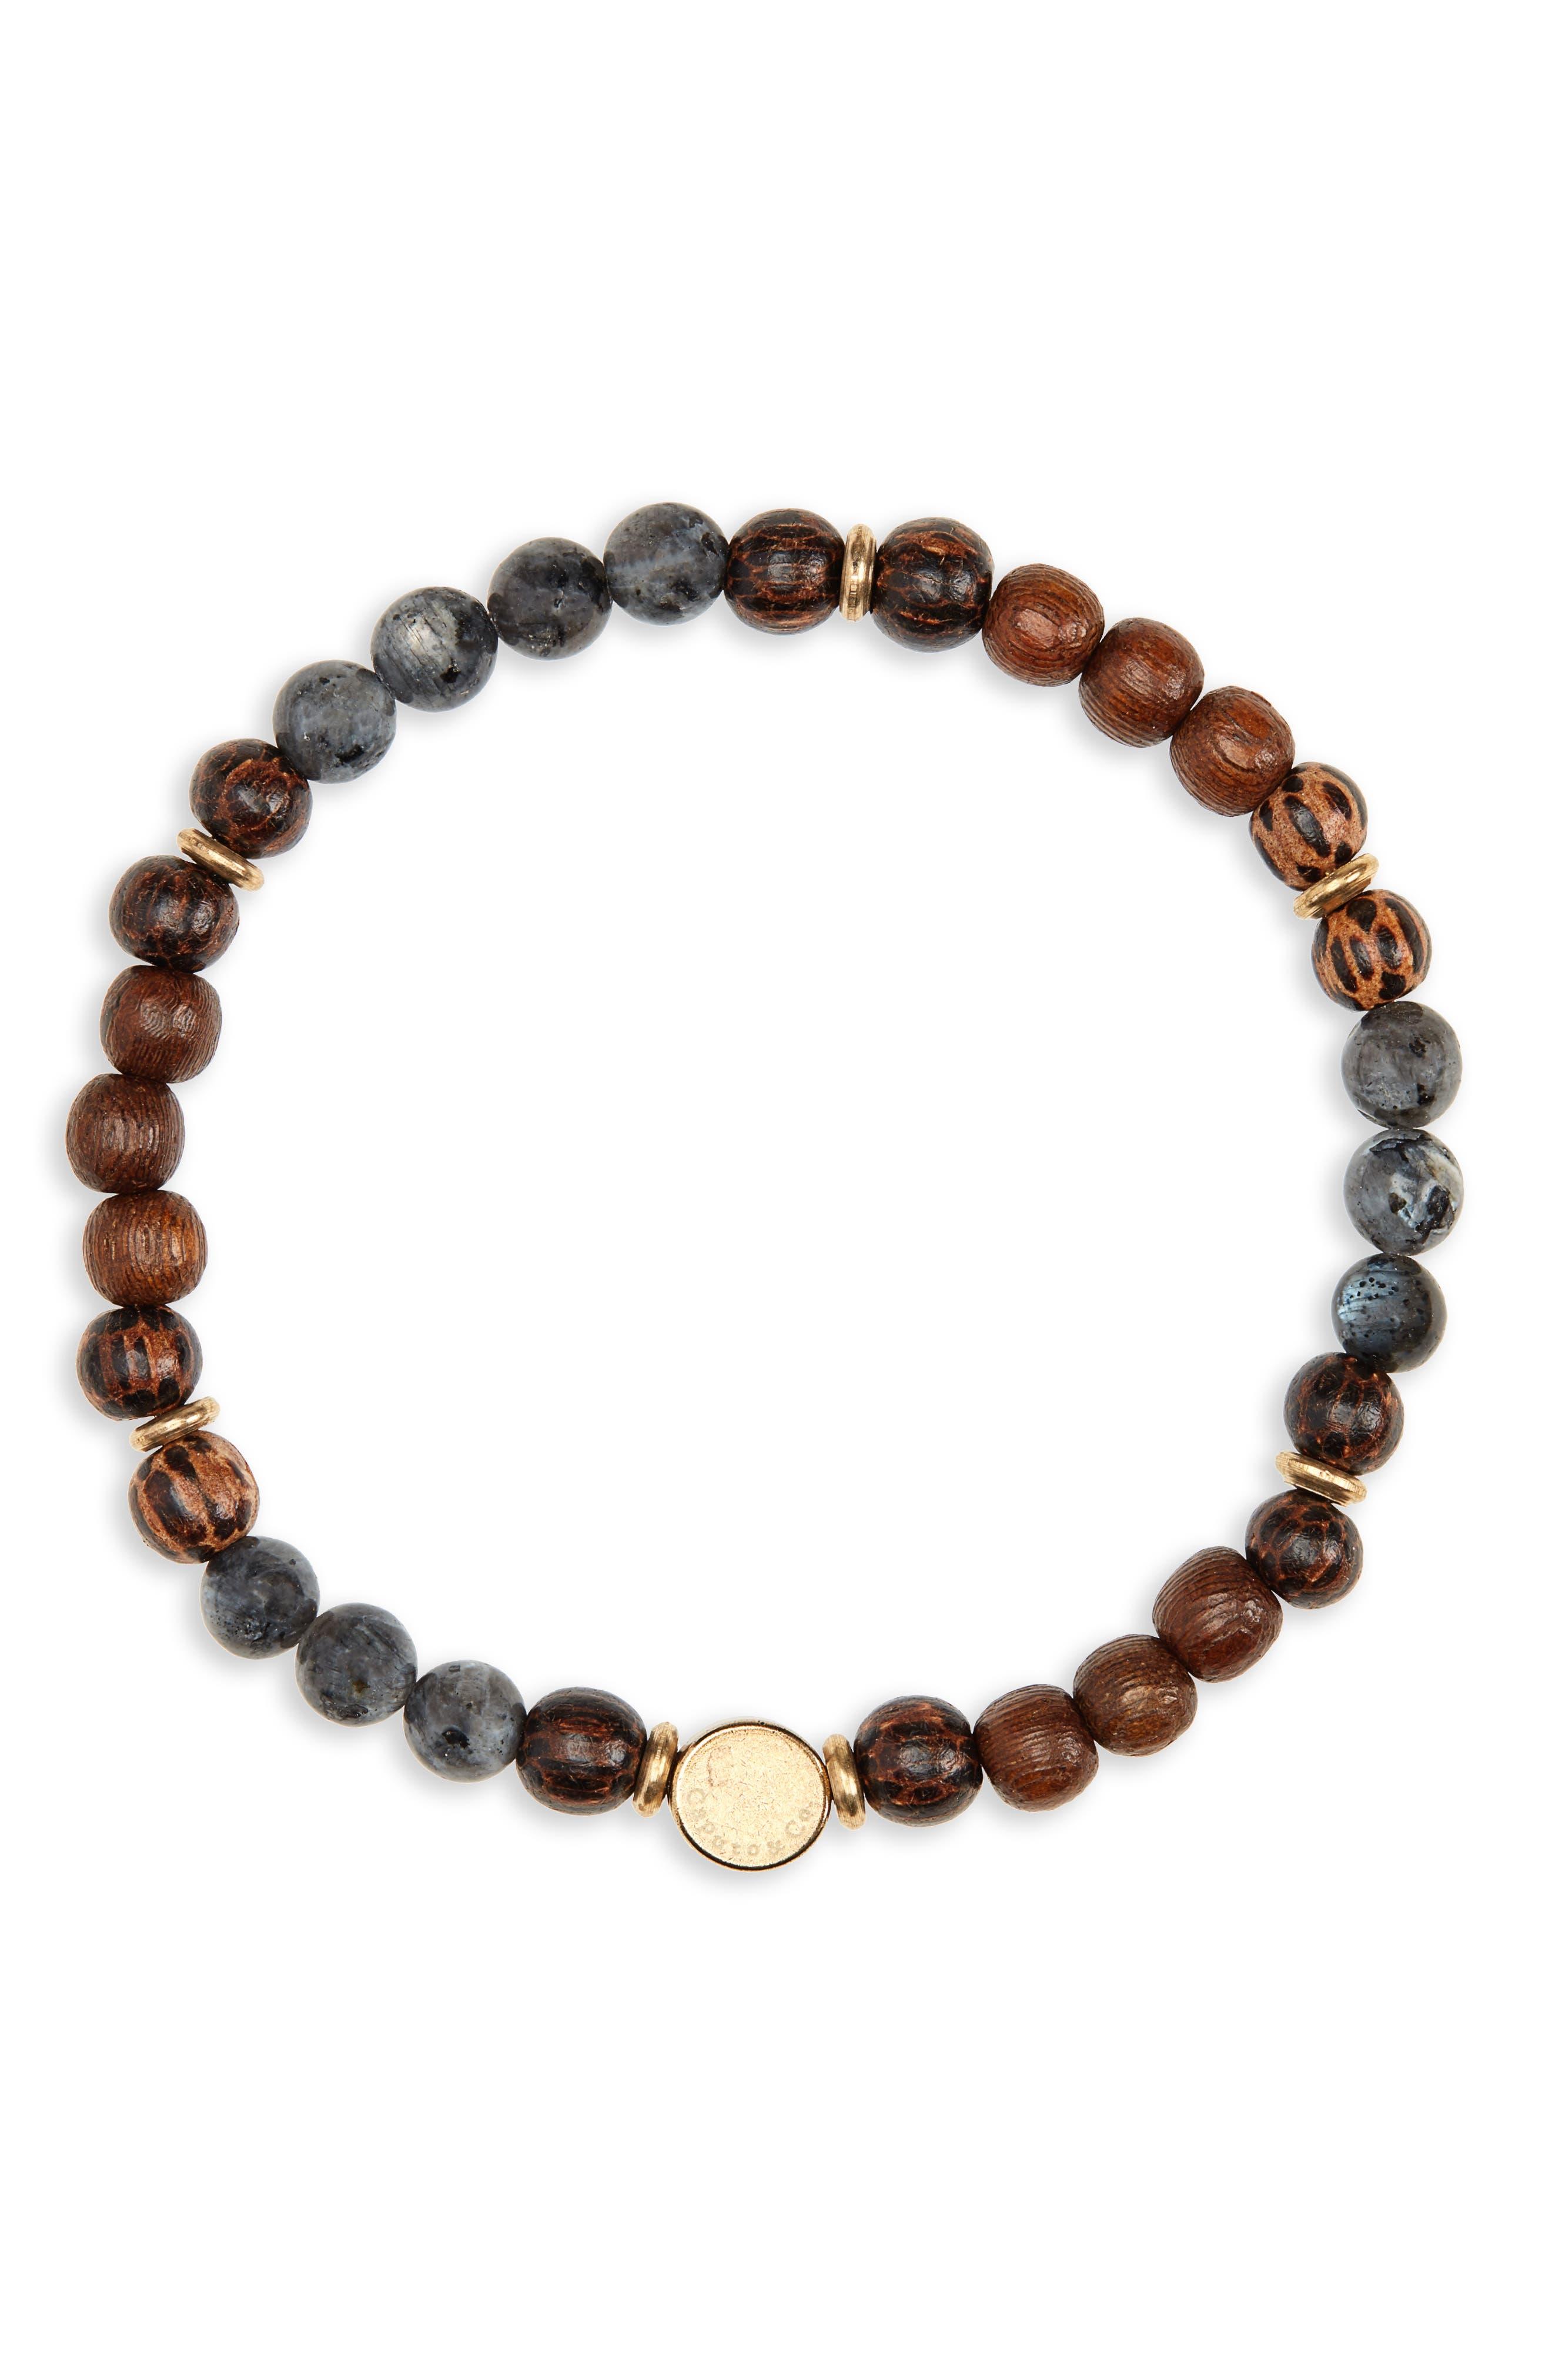 Stone & Wood Bead Bracelet